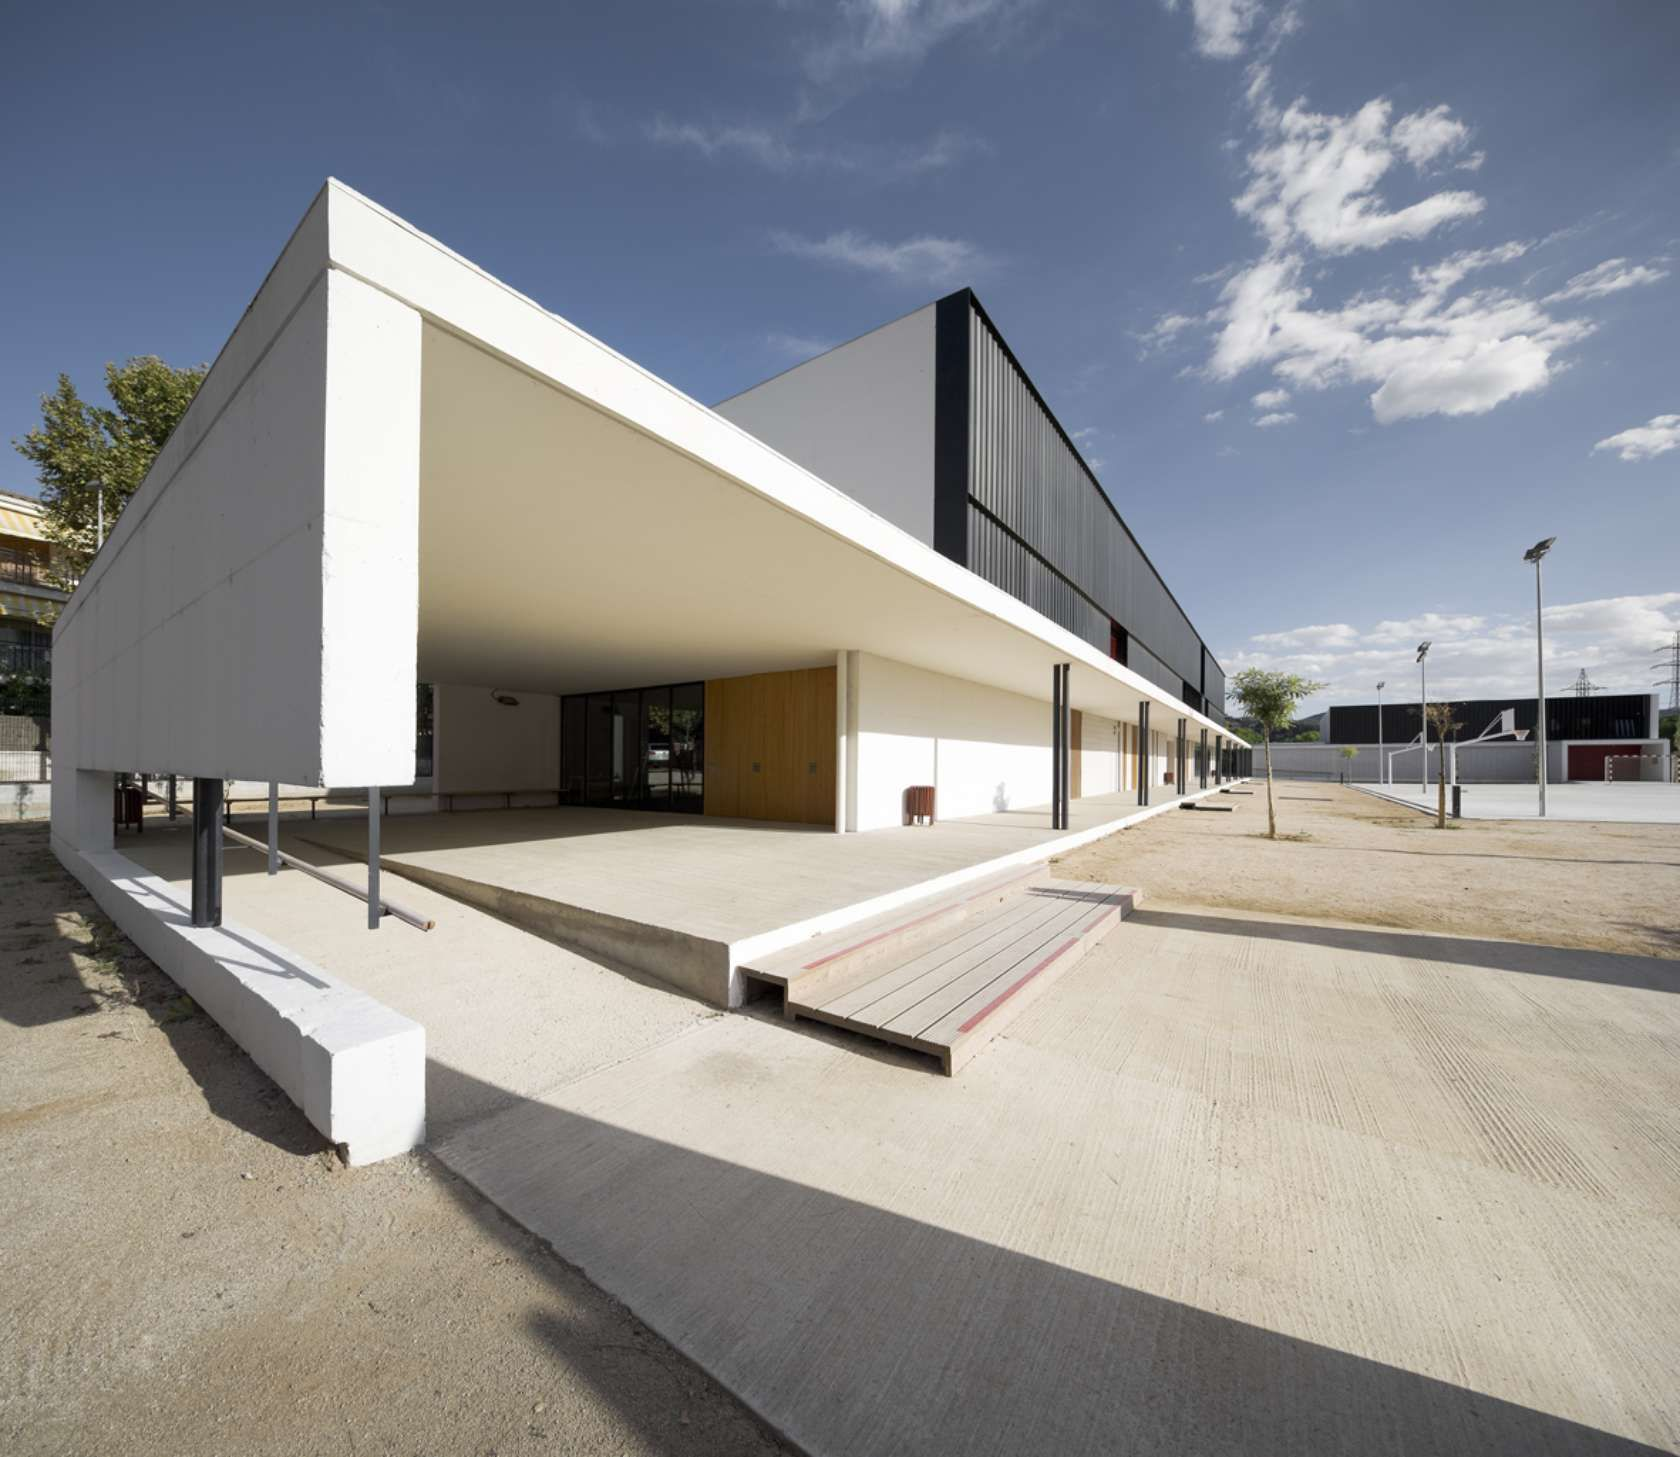 Els Grogs secondary school external space